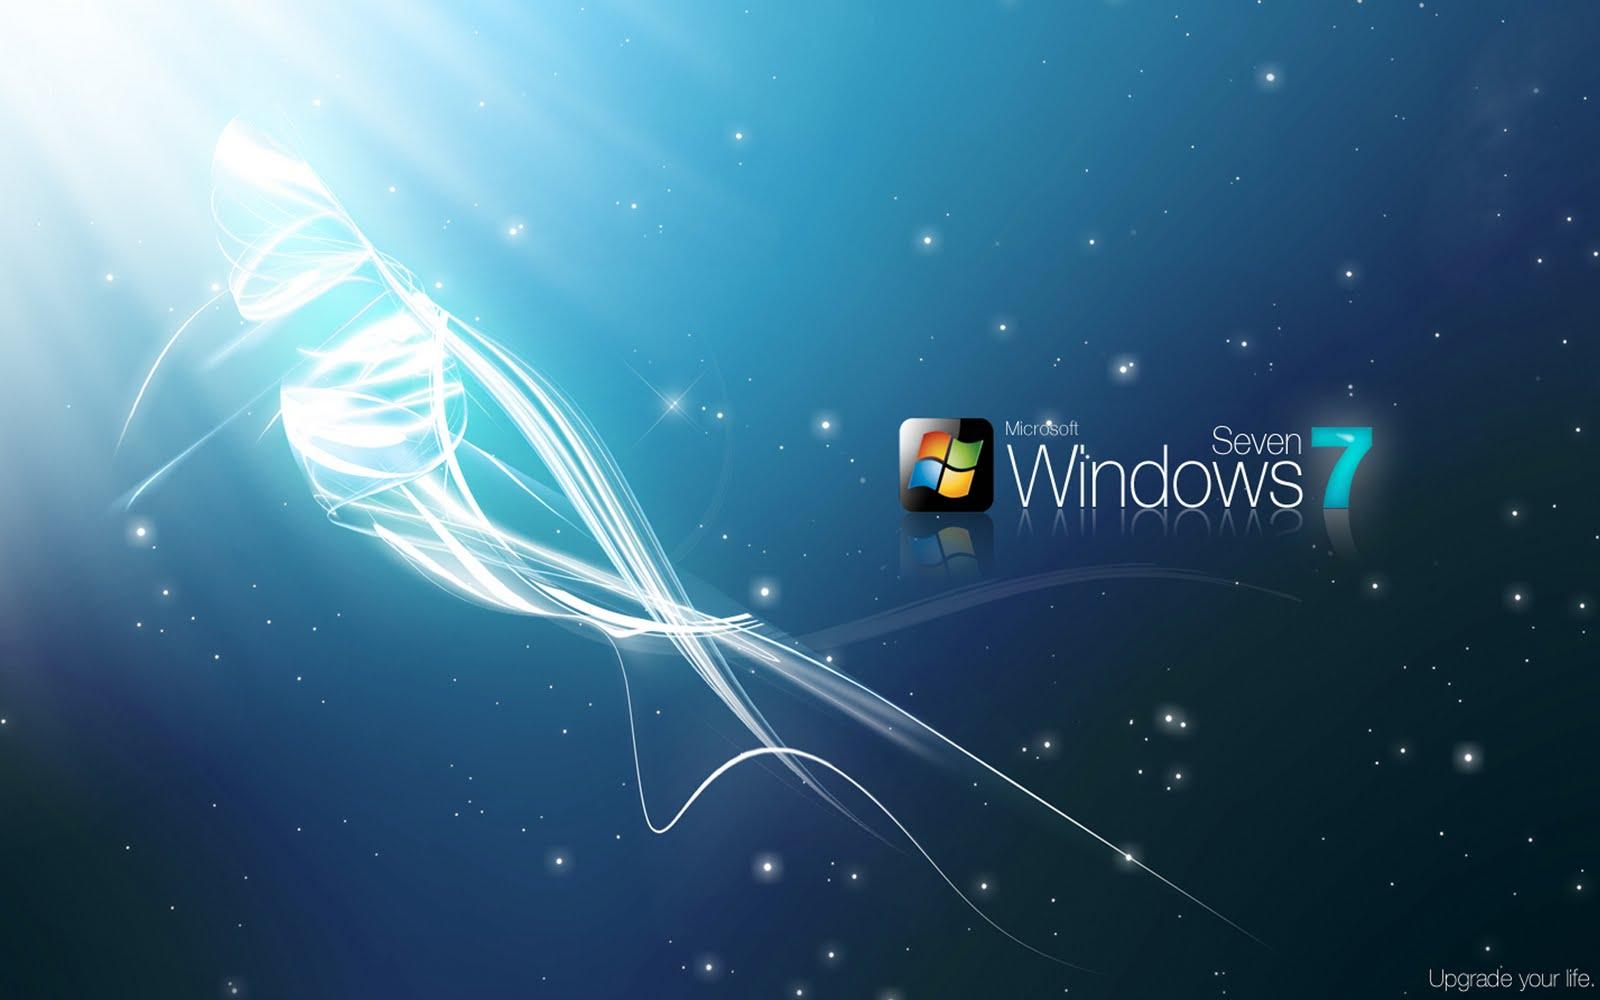 windows 7 wallpaper 1920x1200 hd desktop wallpaper